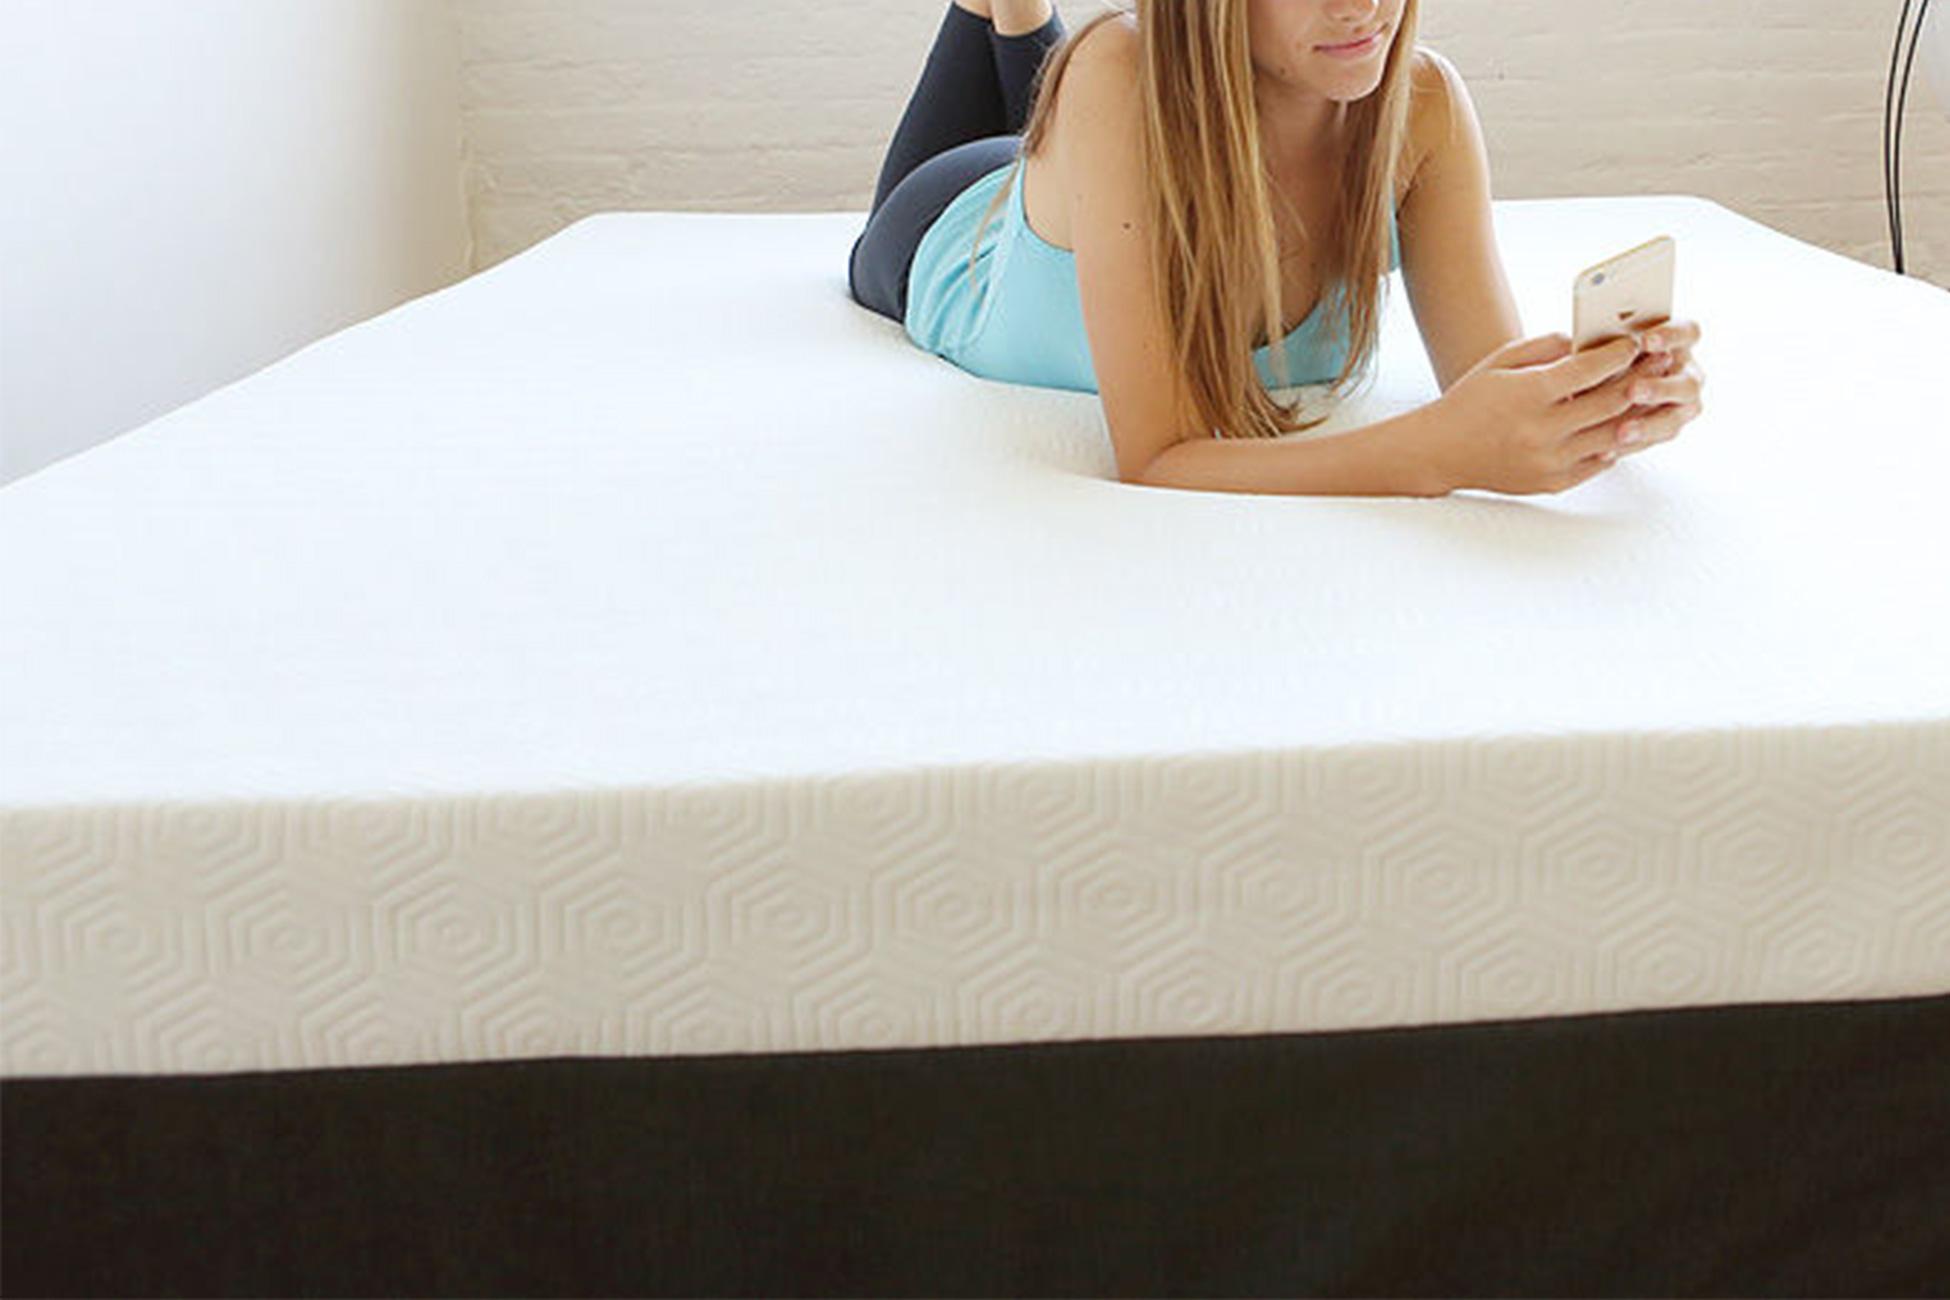 Will These Techy Pajamas Help You Sleep Better Carley K